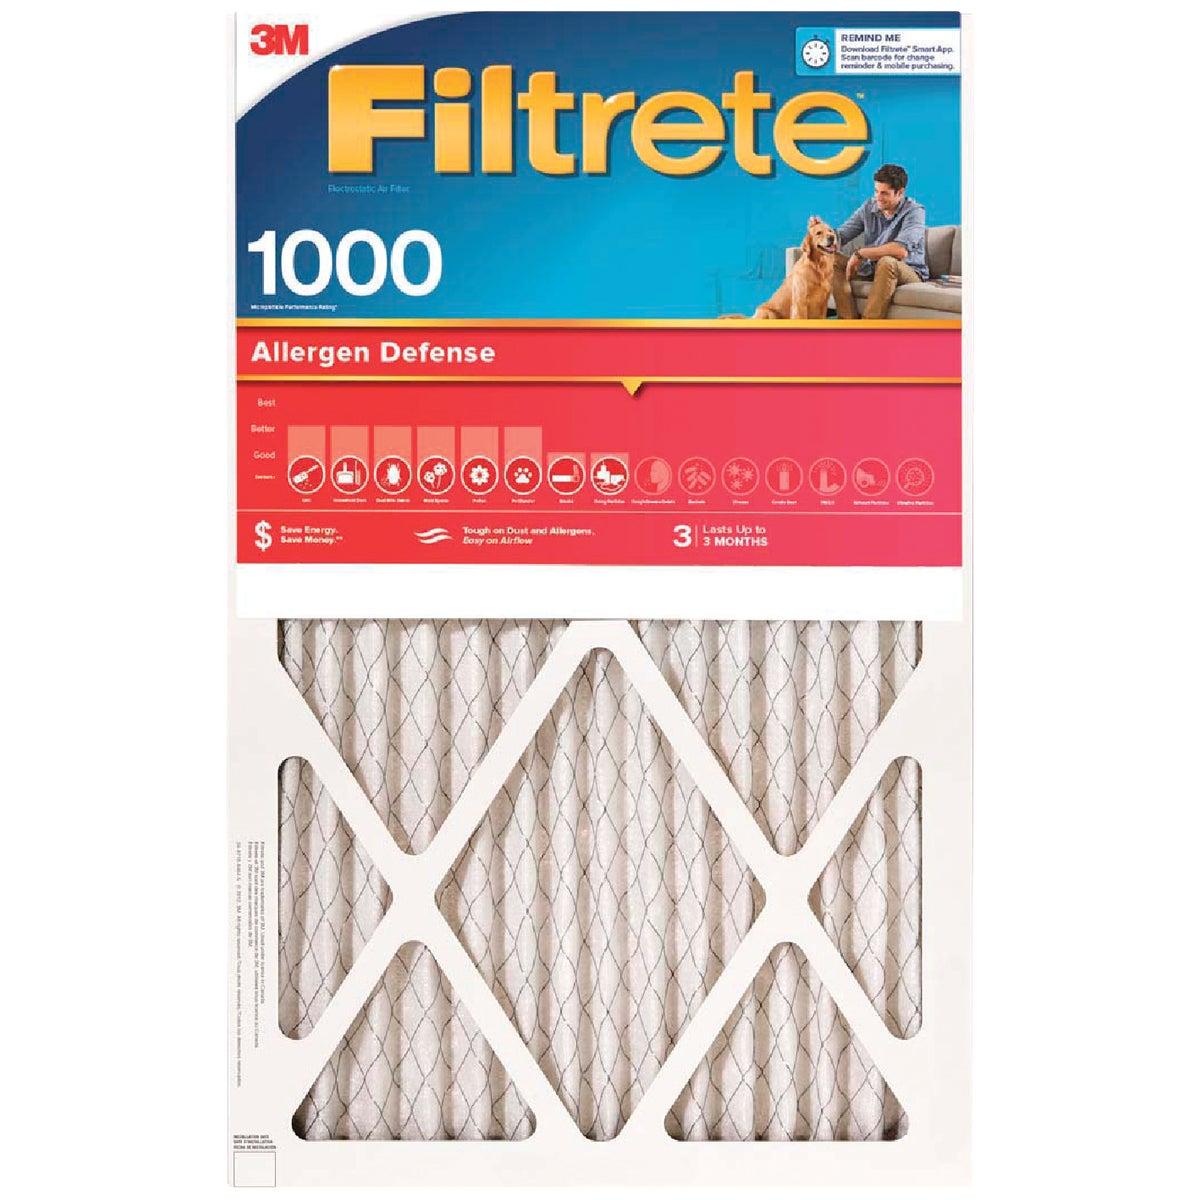 3M Filtrete 14 In. x 24 In. x 1 In. Allergen Defense 1000/1085 MPR Furnace Filter